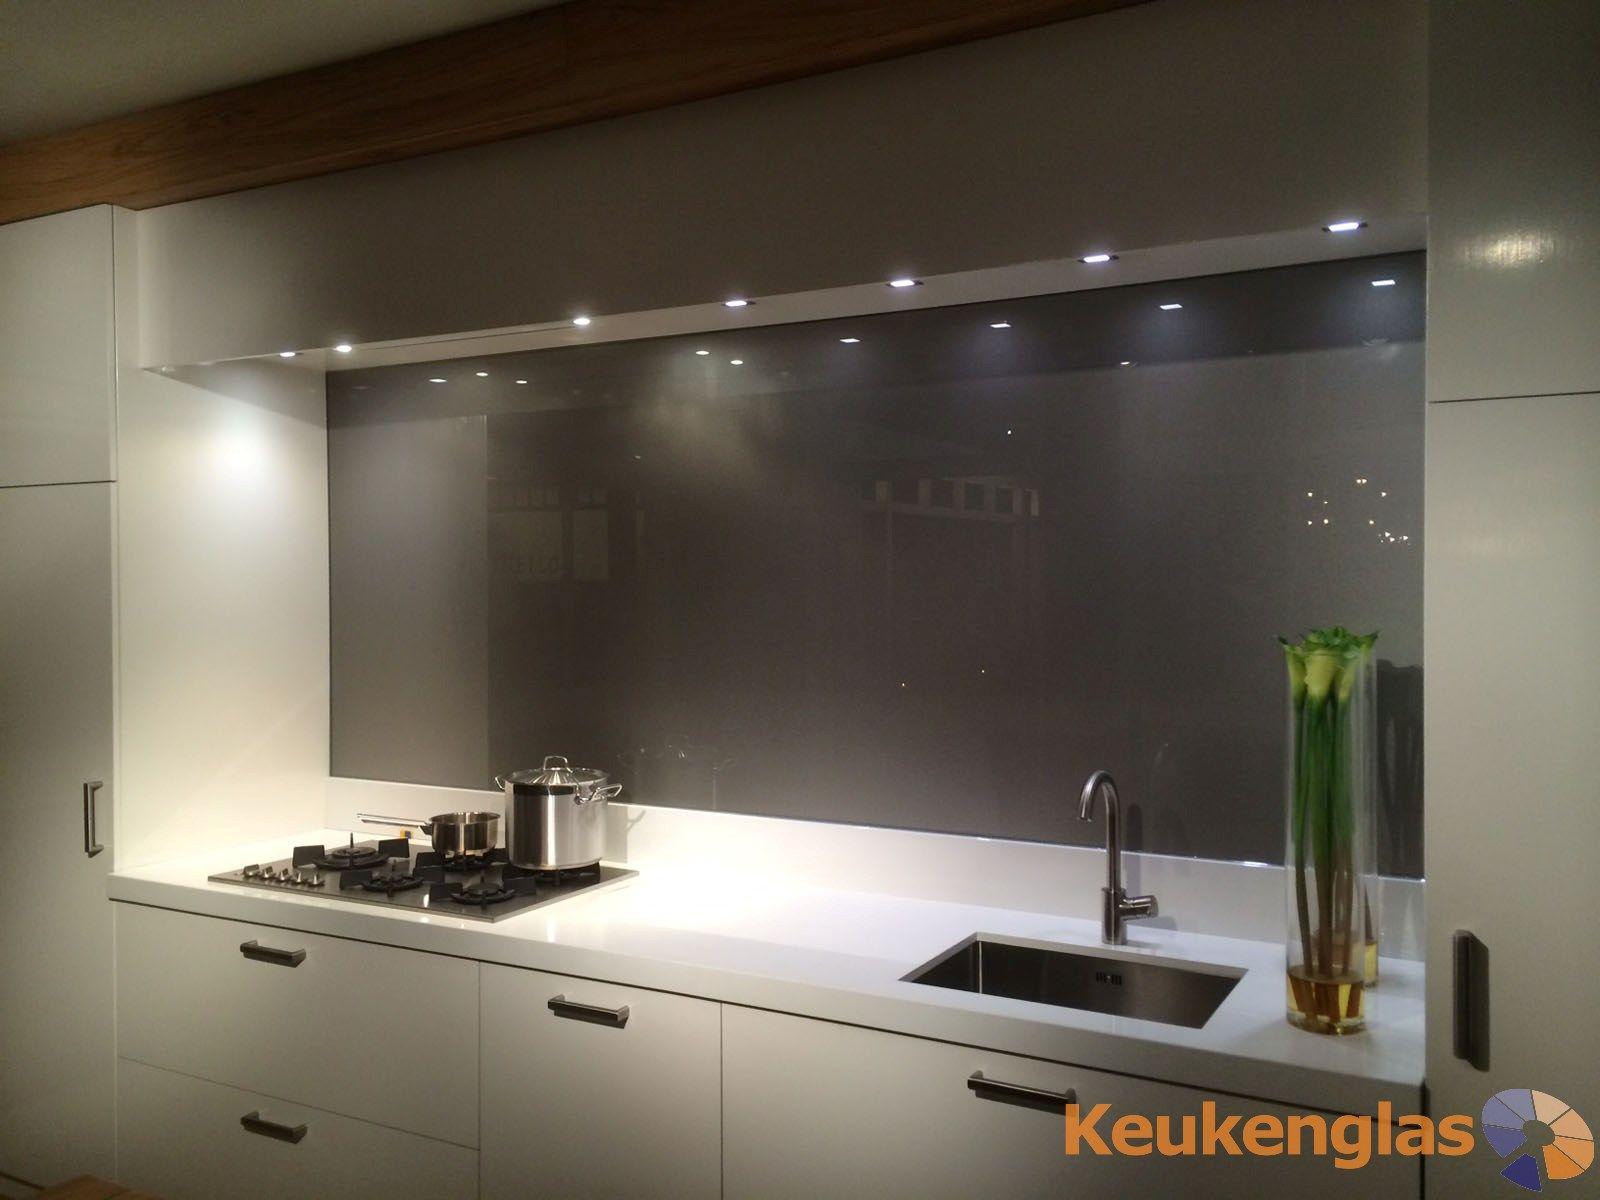 Glazen Keuken Achterwand : Glazen keuken achterwand donkergrijs metallic lighting interior